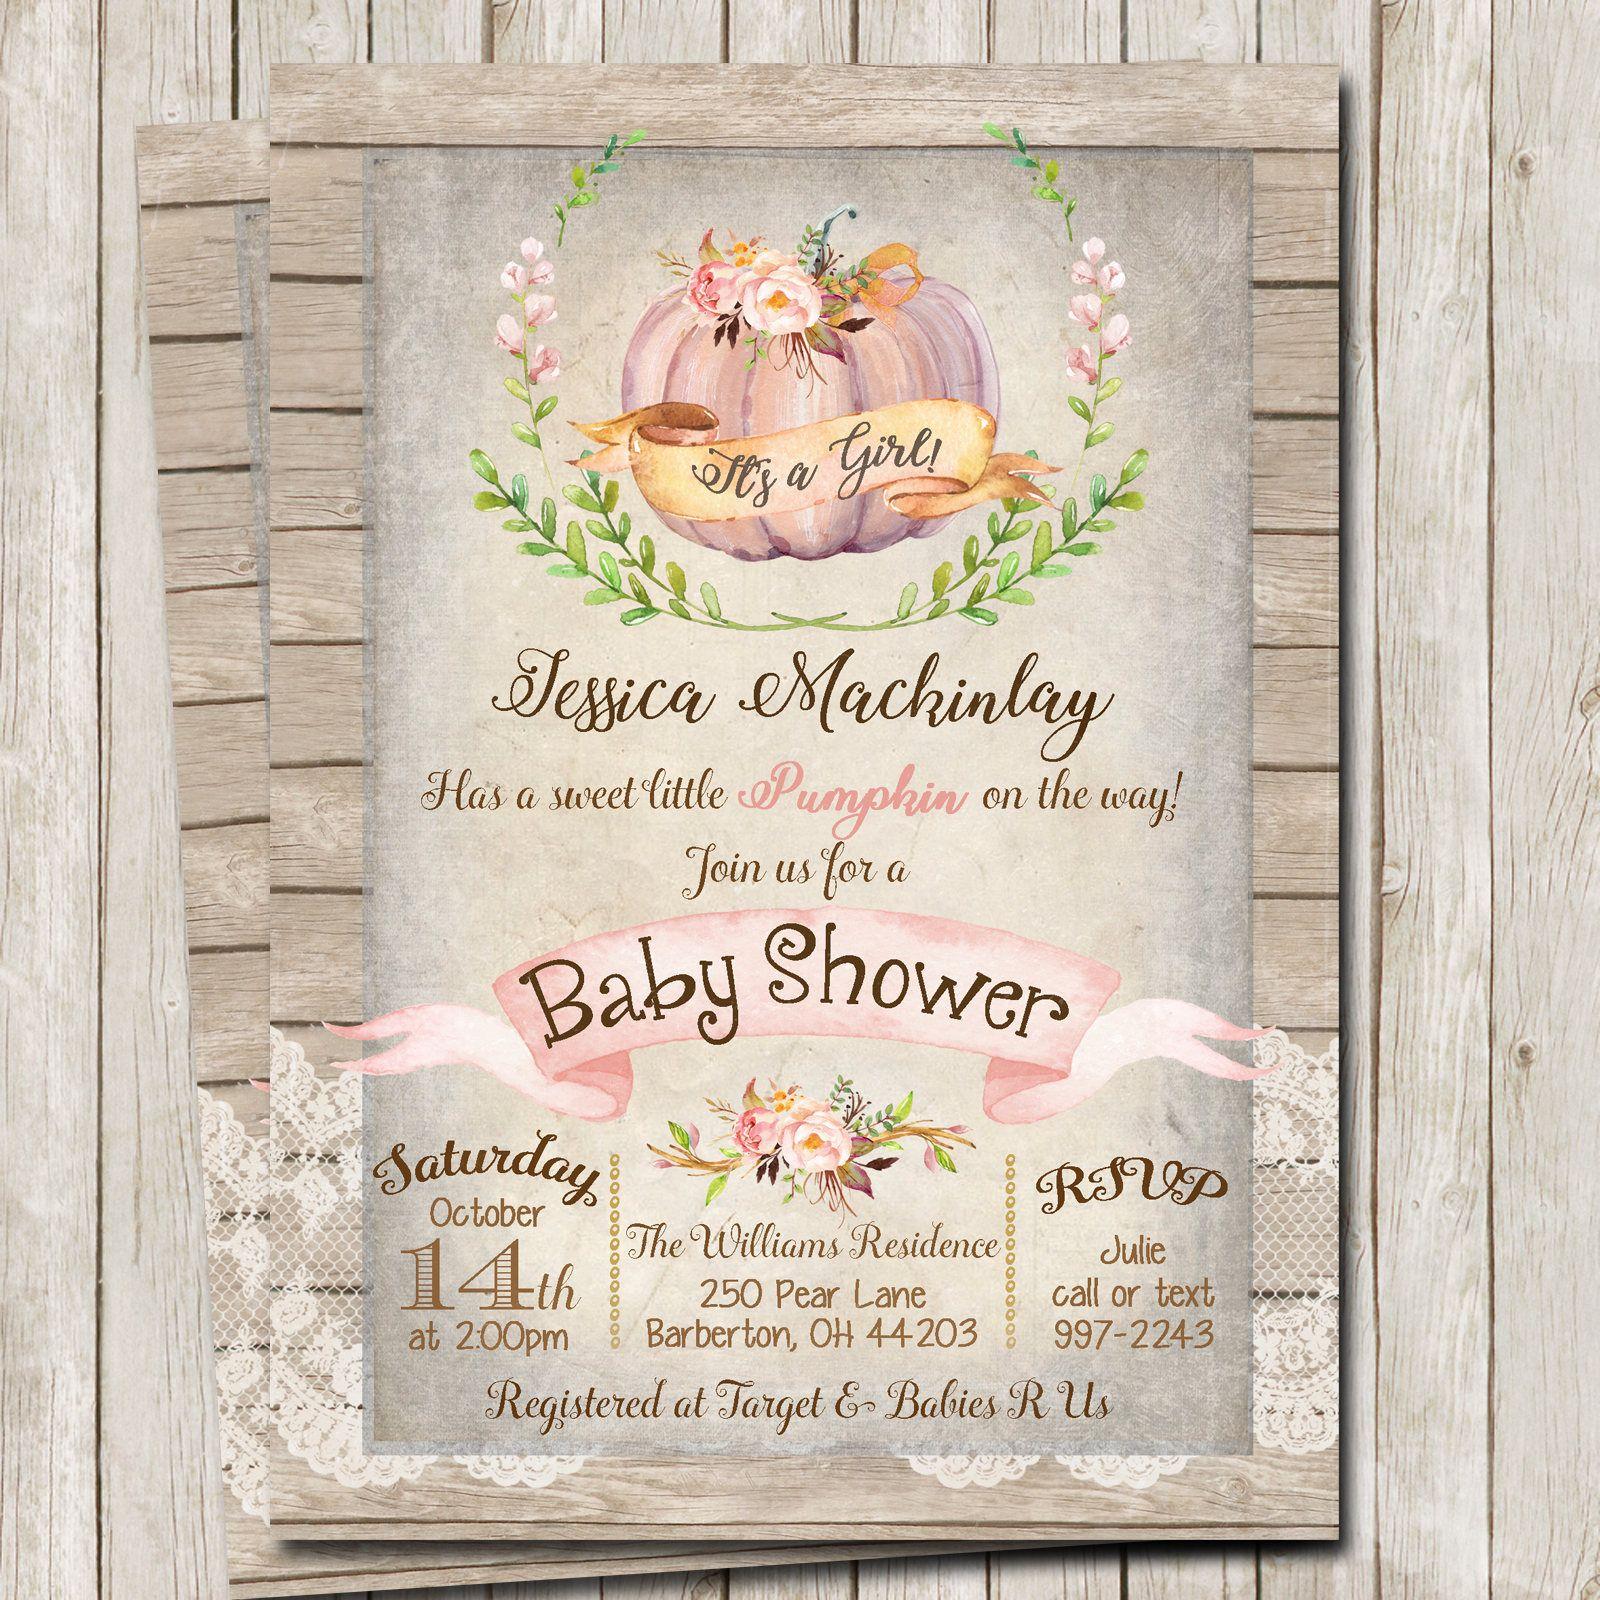 Girl Pumpkin Baby Shower Invitation, Rustic Baby Shower Invitation ...